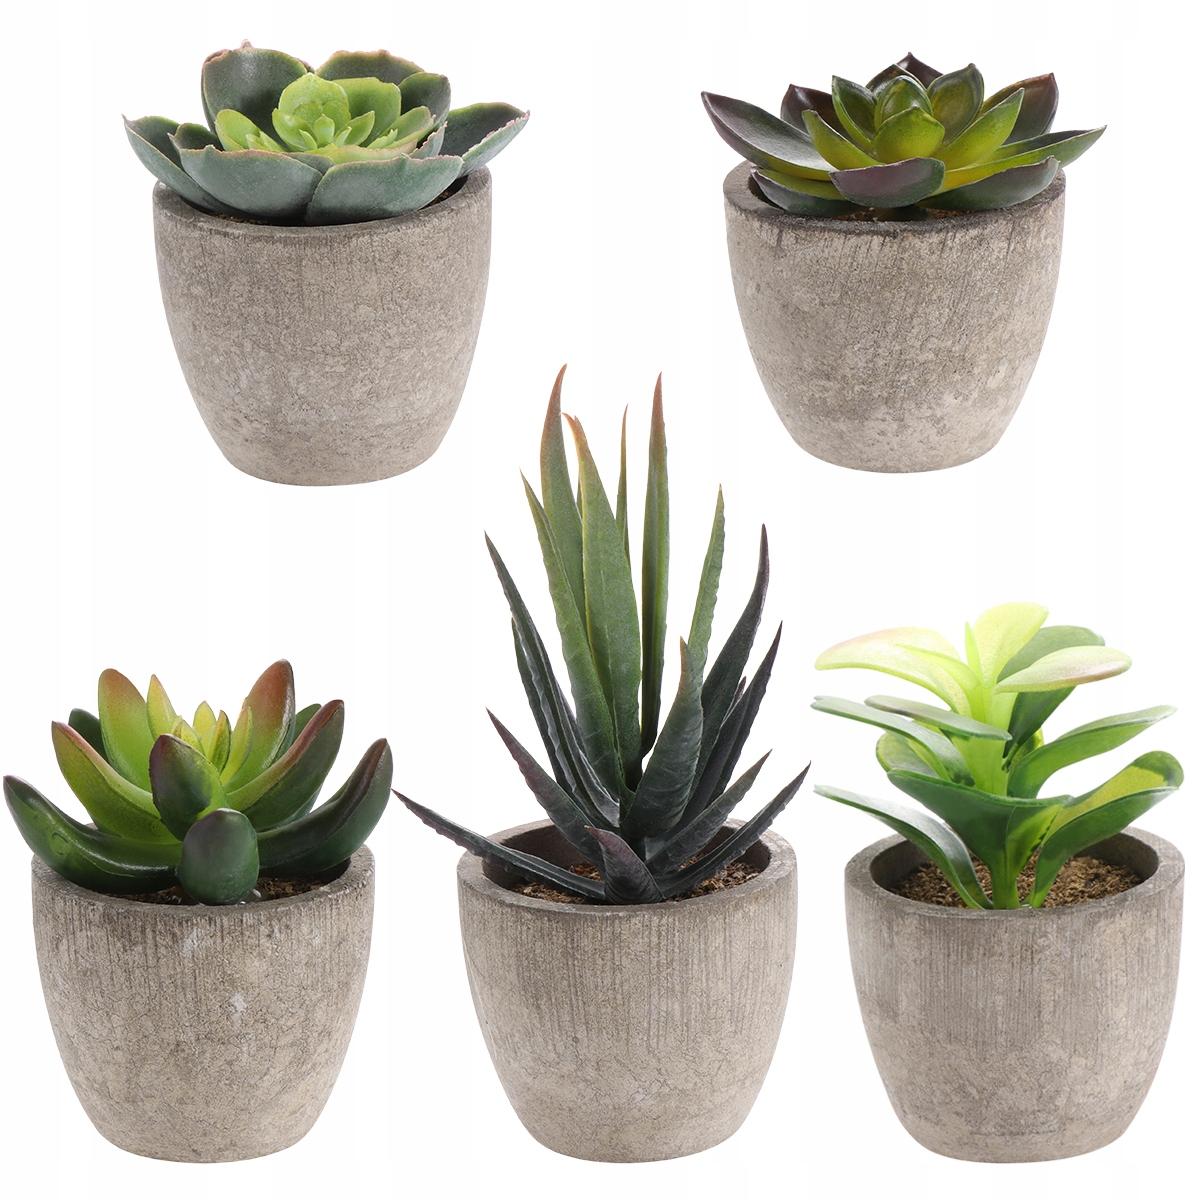 Yardwe 5PCS Retro Artificial Succulents Simulation